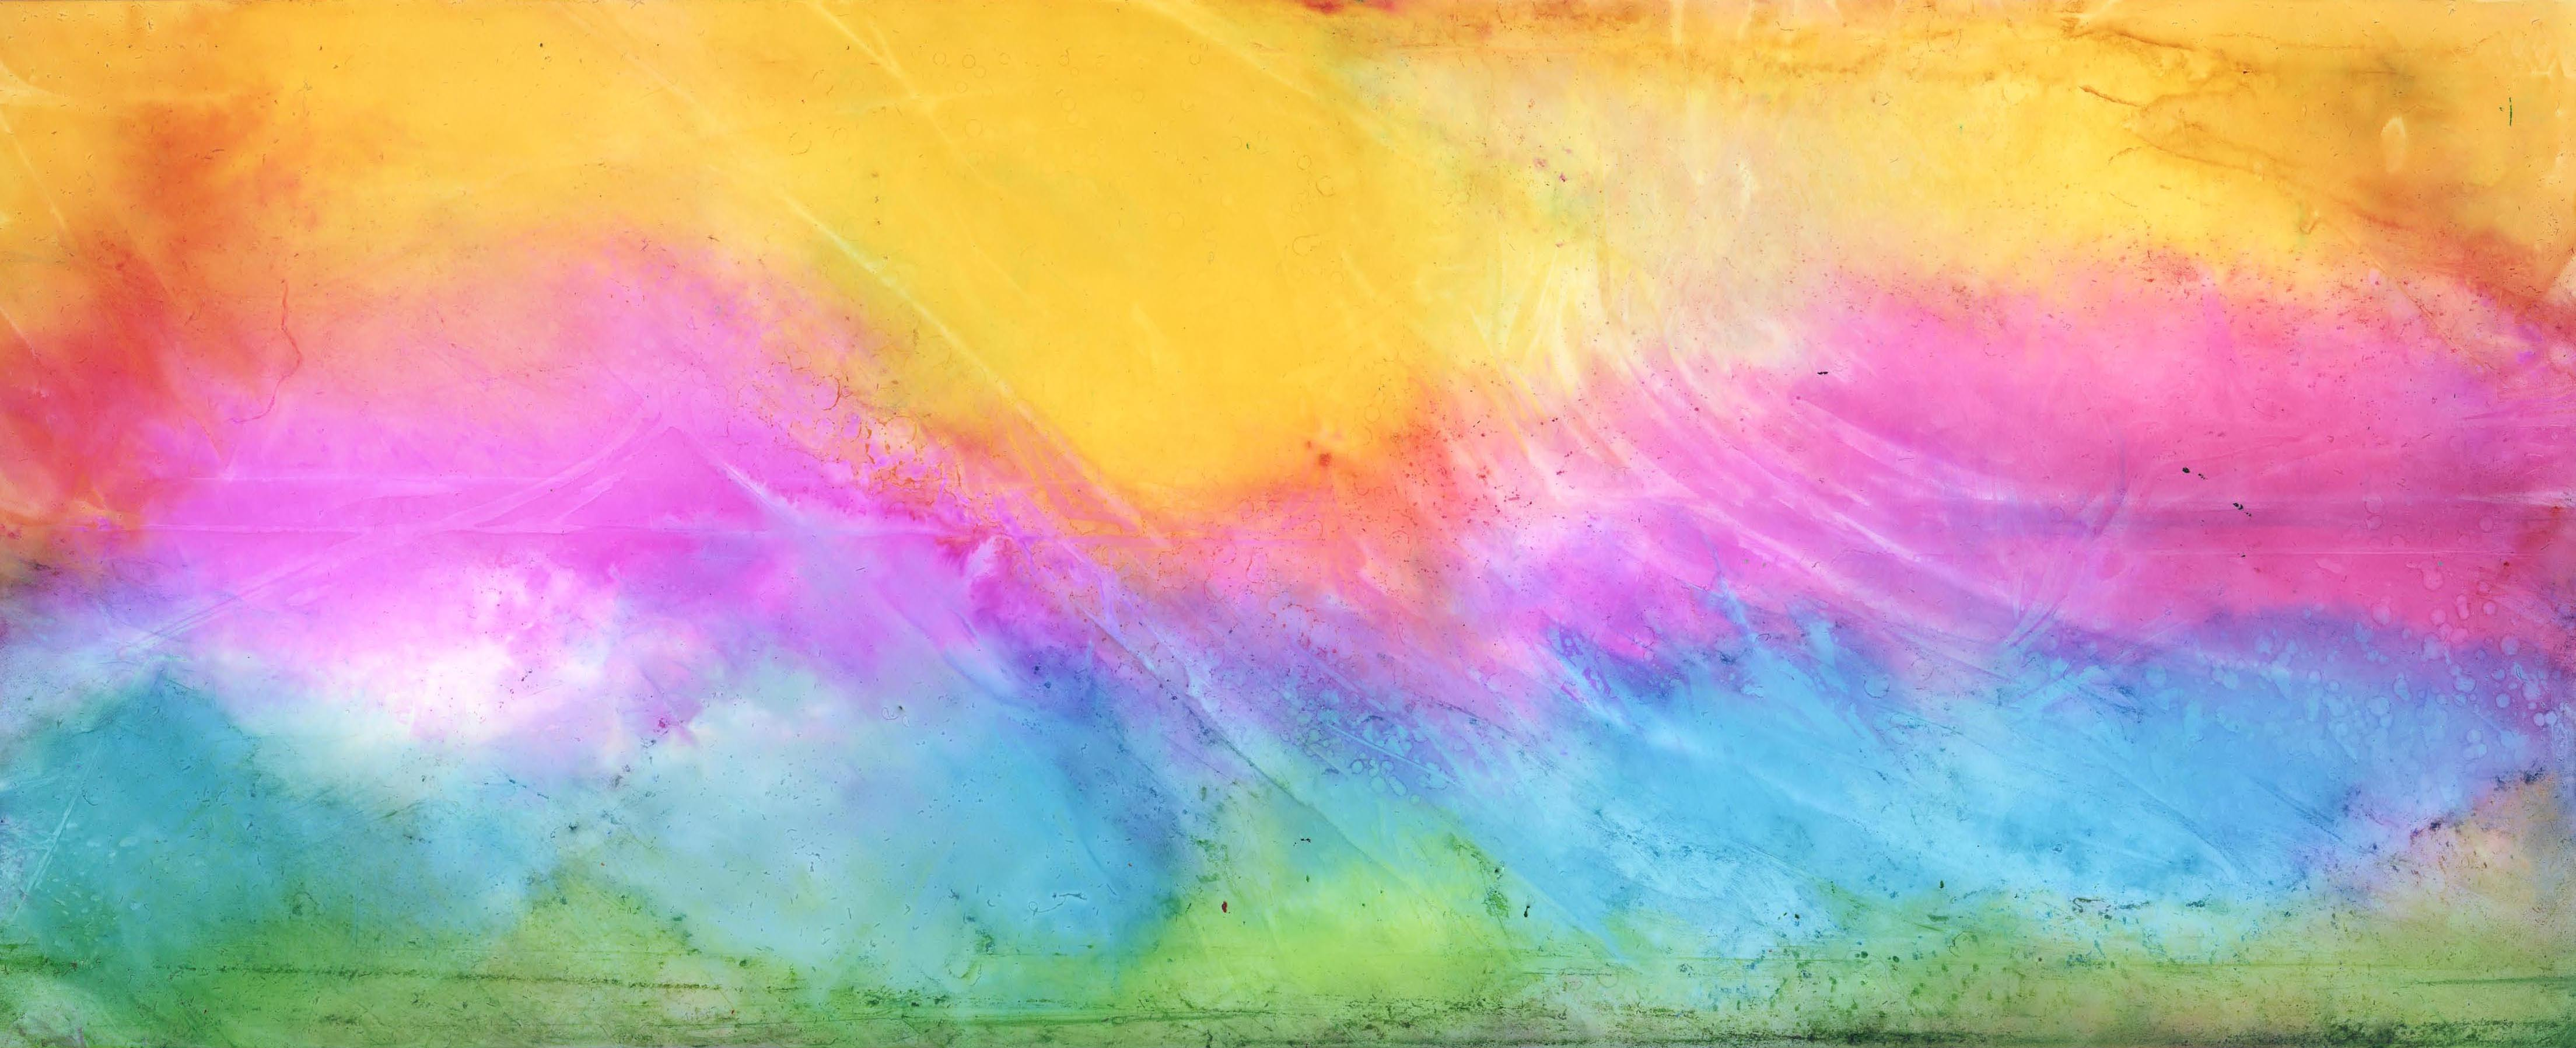 Pastel Landscape - Alcohol Ink - 6 X 15 - $150